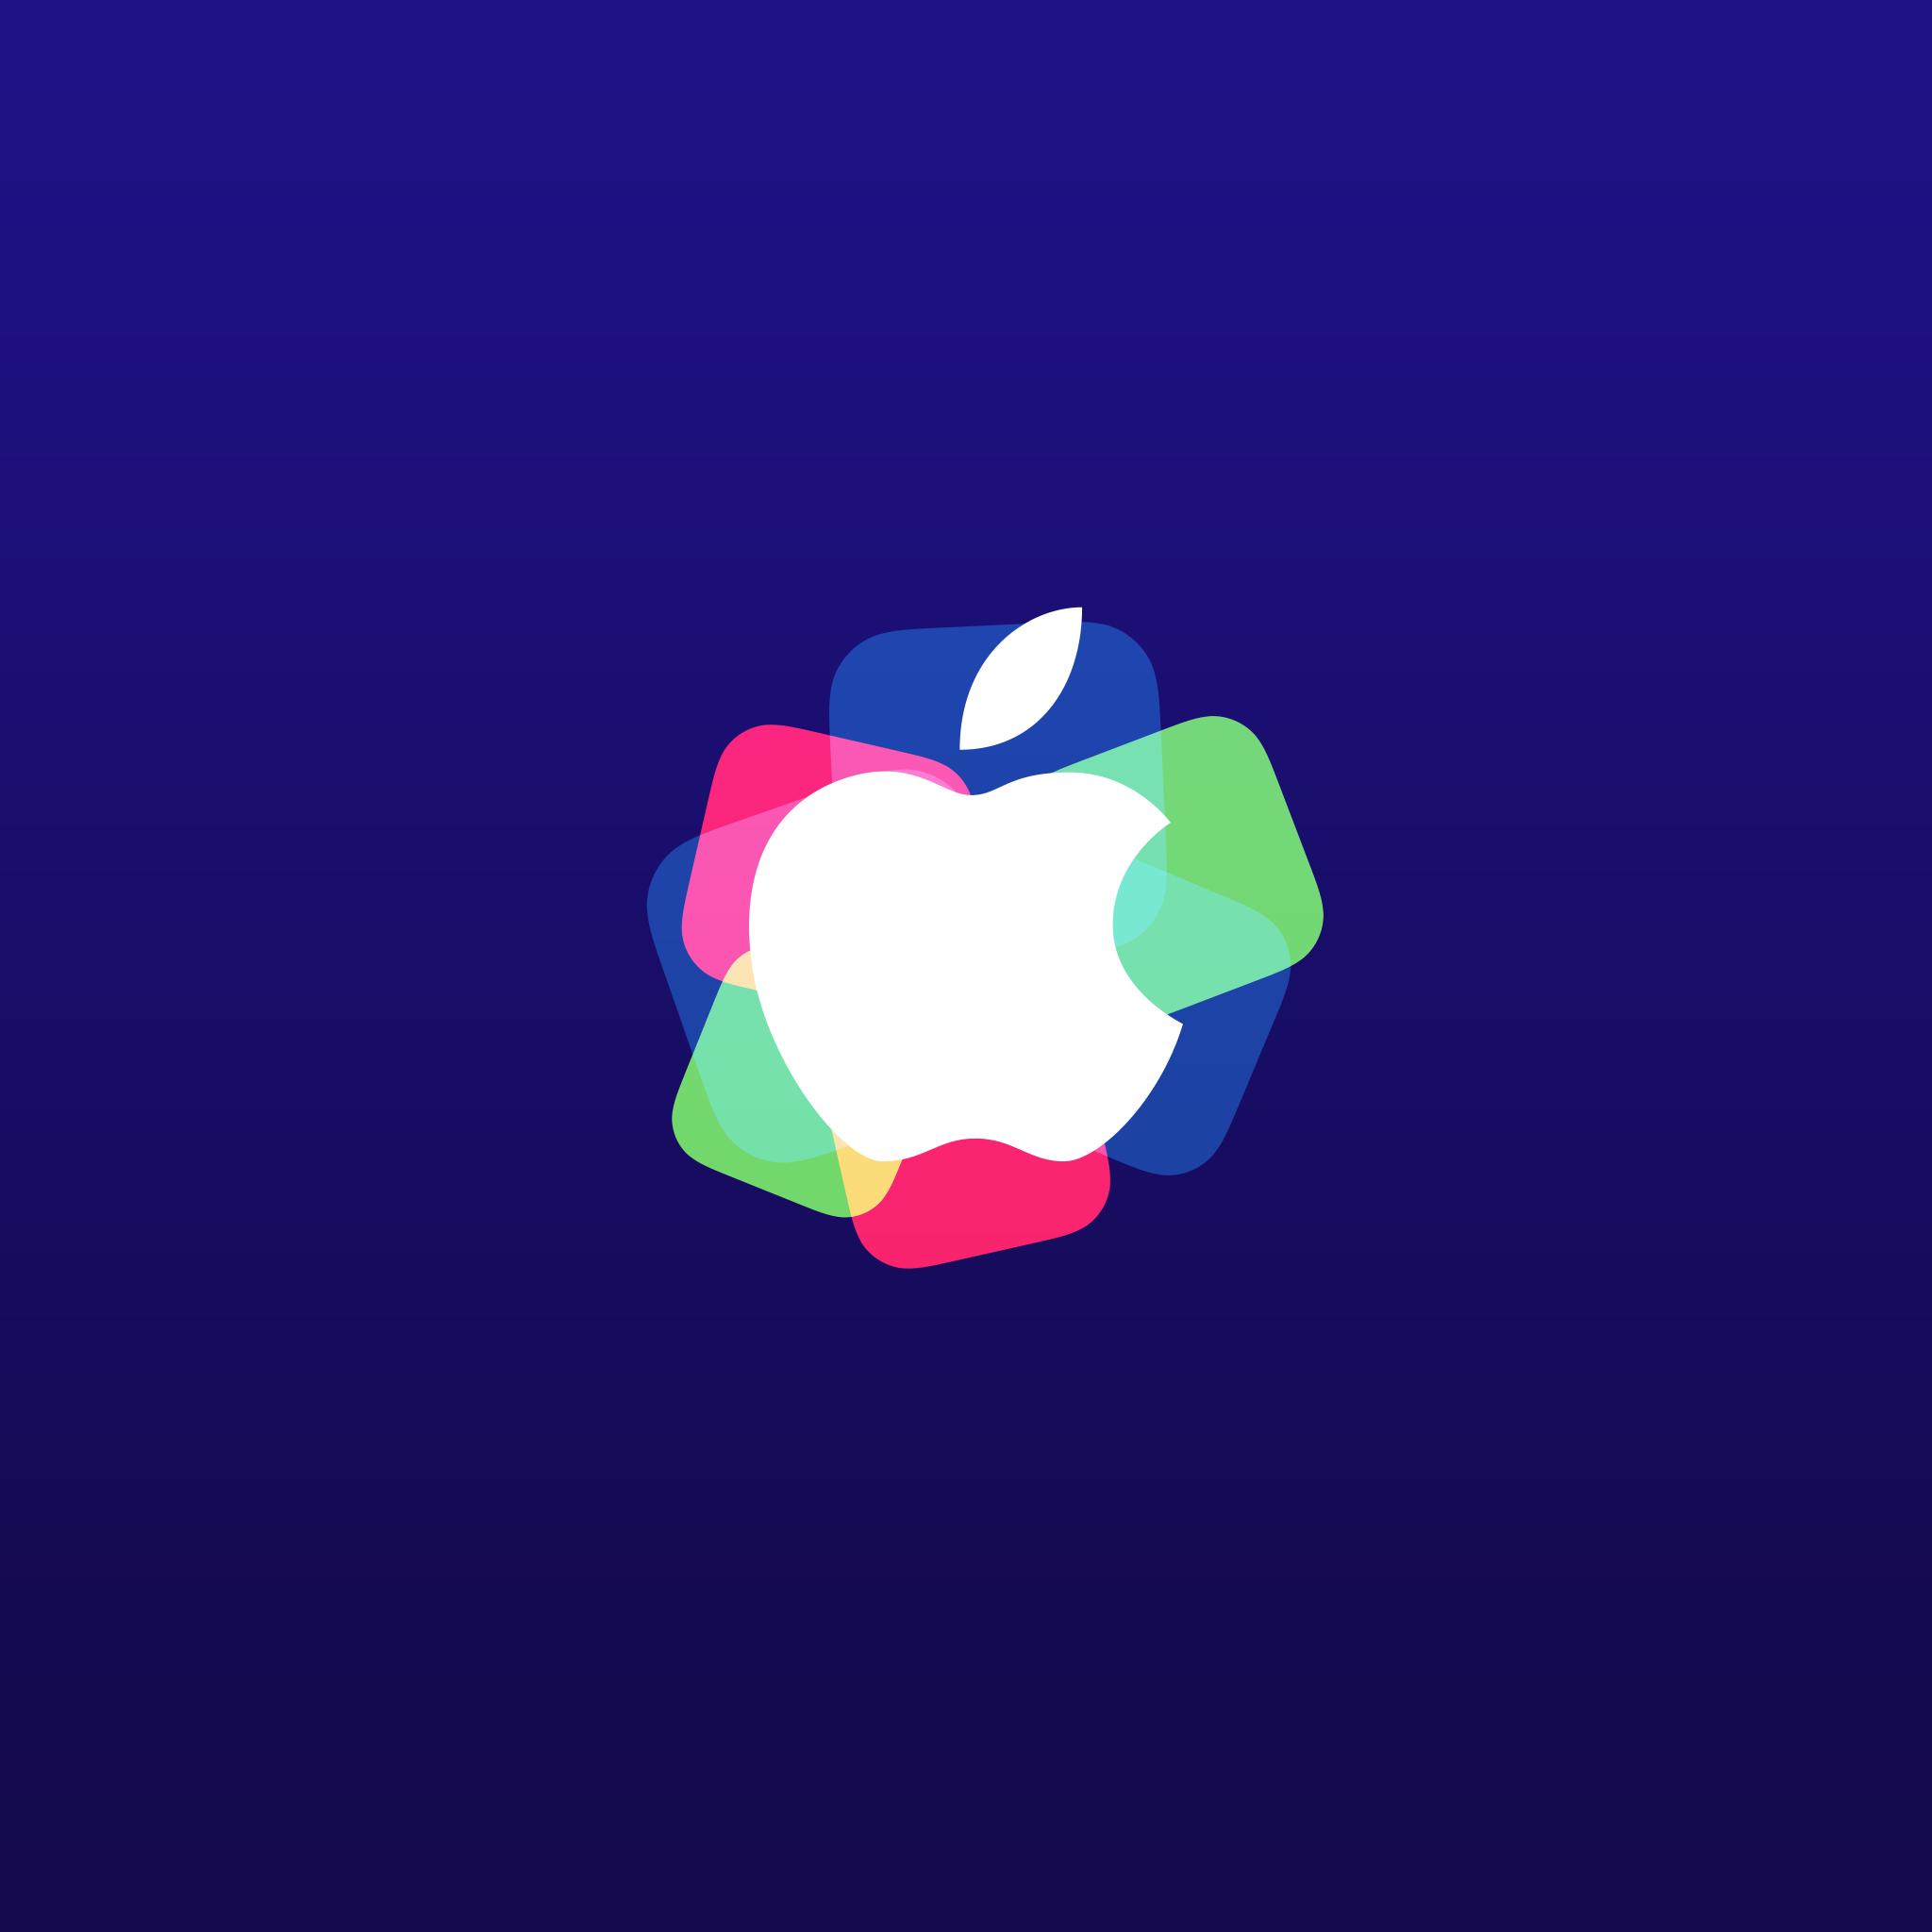 Apple Event September 9 Wallpaper Bart172 Ipad Apple Logo Event 2048x2048 Download Hd Wallpaper Wallpapertip